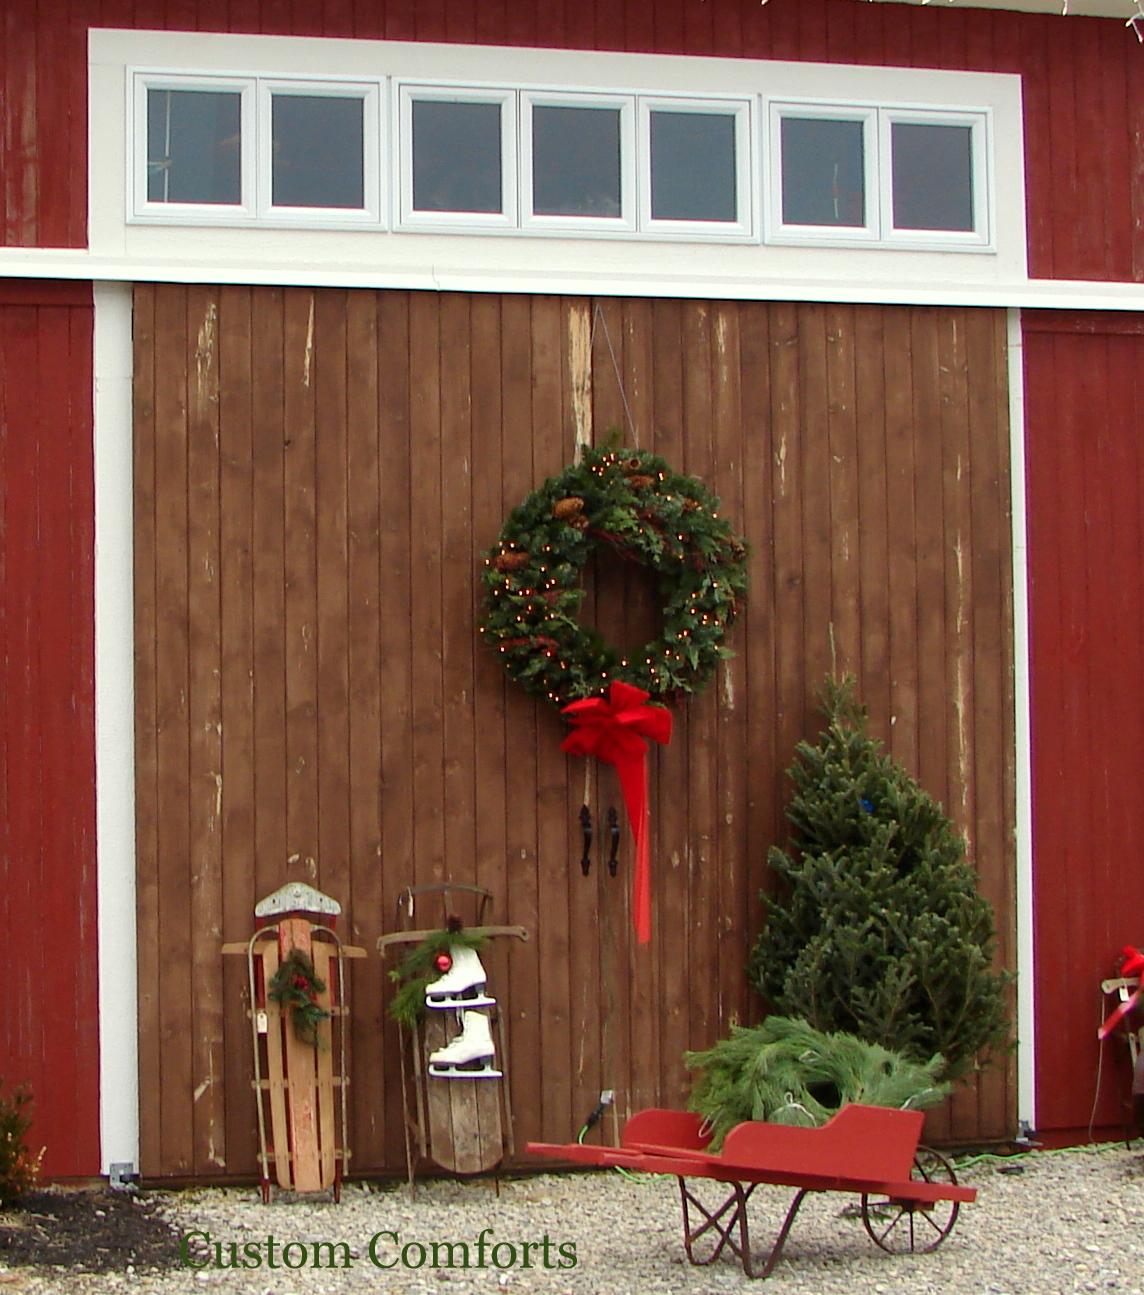 Custom Comforts: French Hen Farm Barn Sale